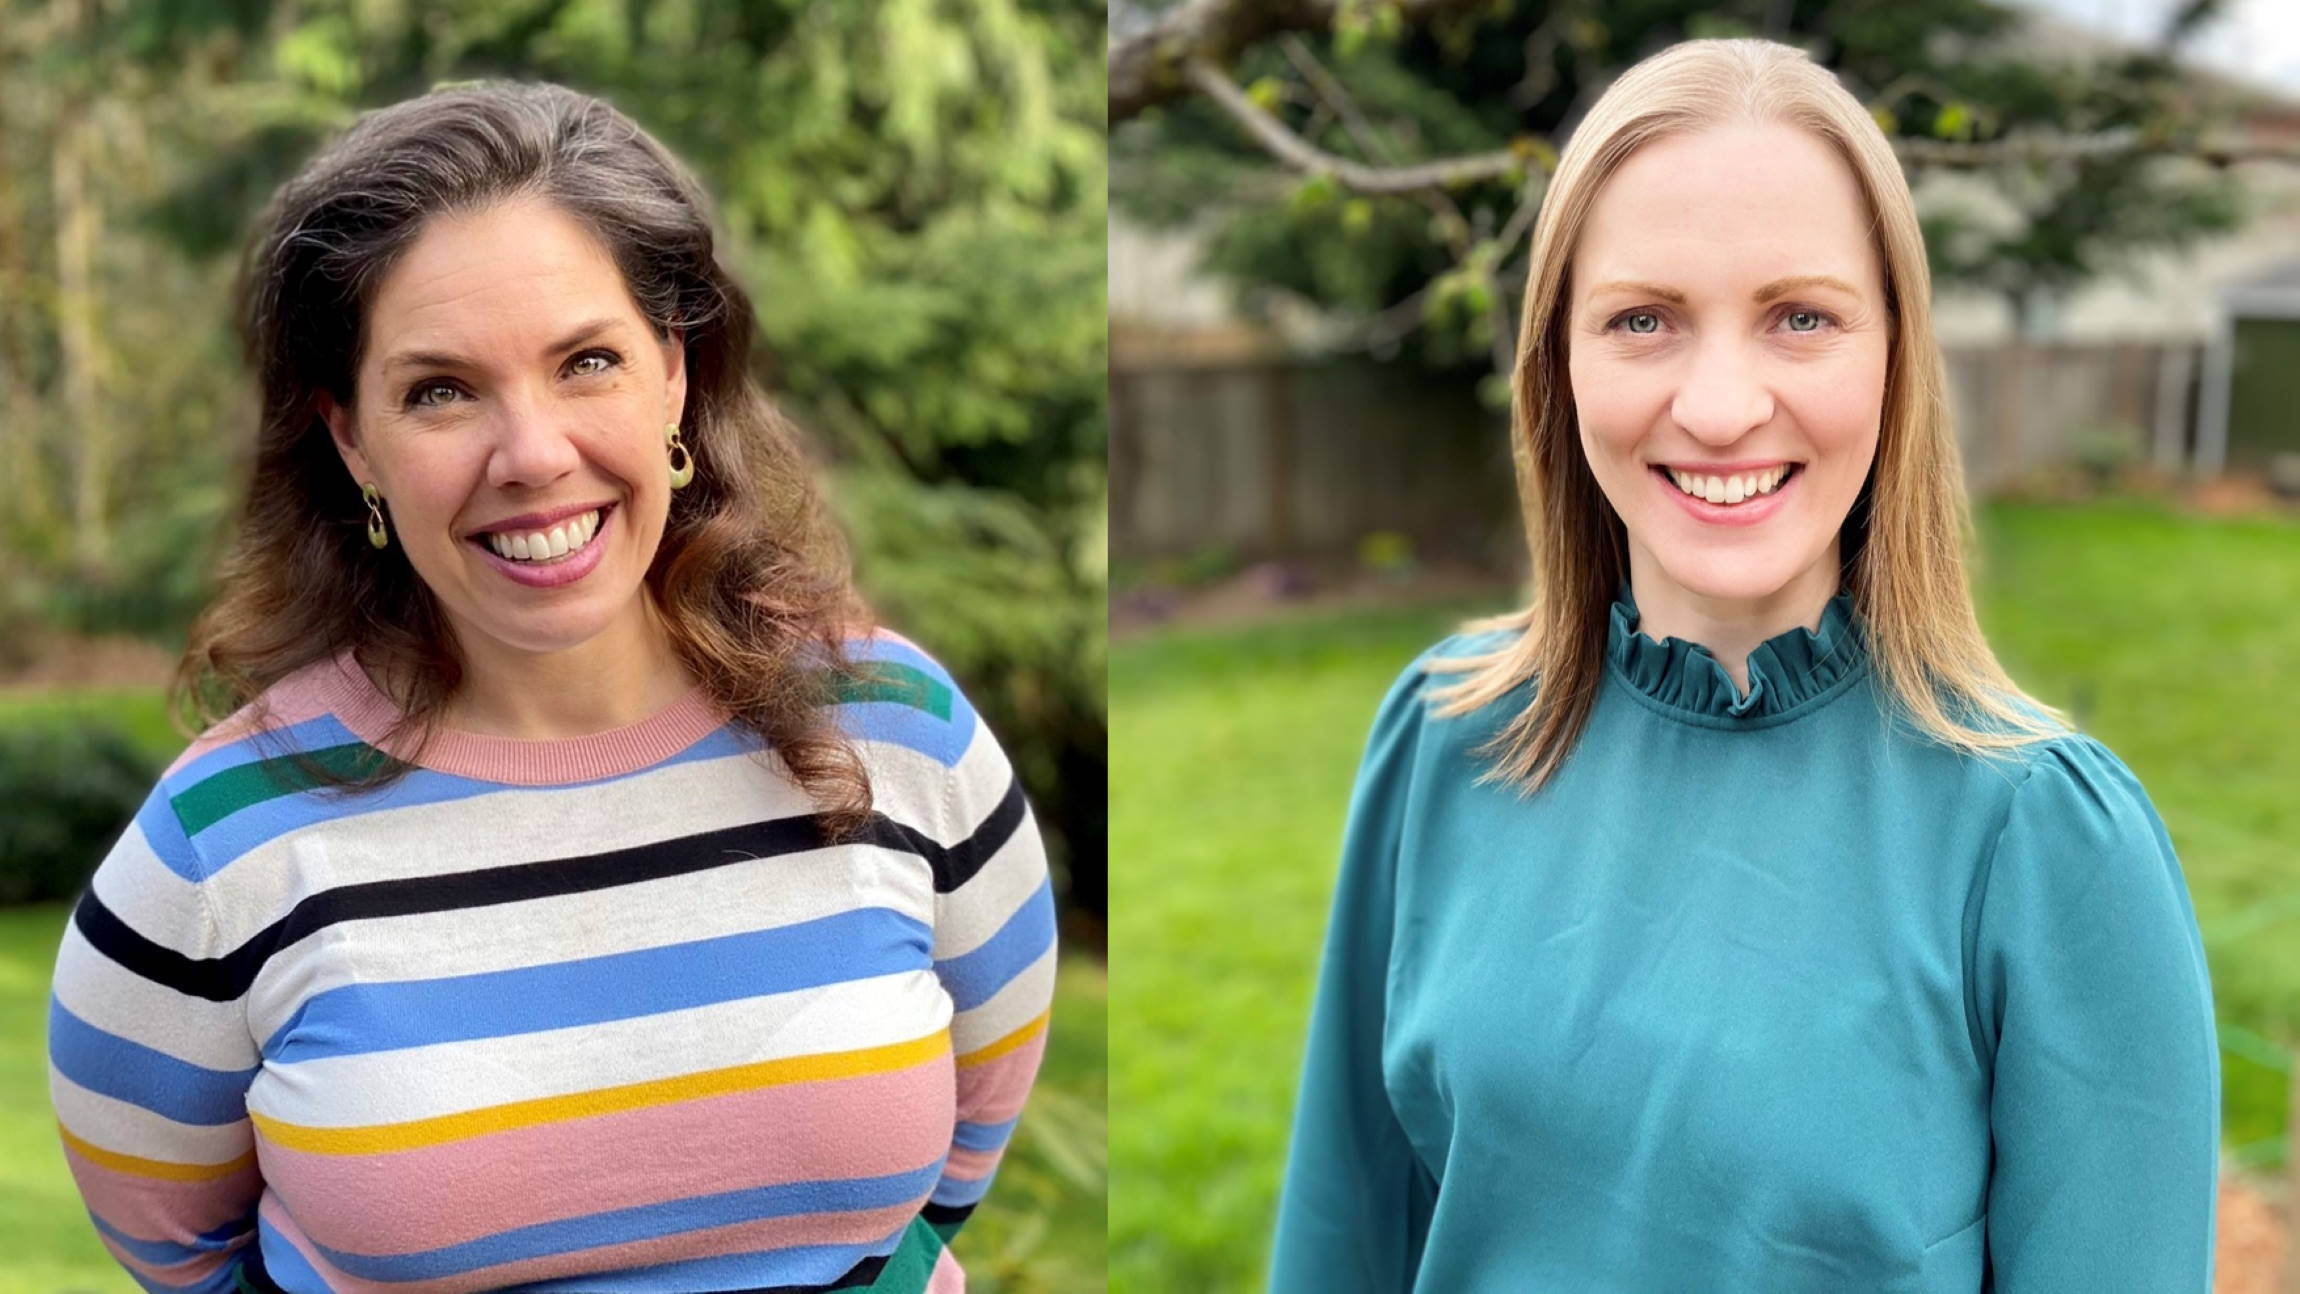 Sara Bush (left) and Sarah Lundy smile for their photos.